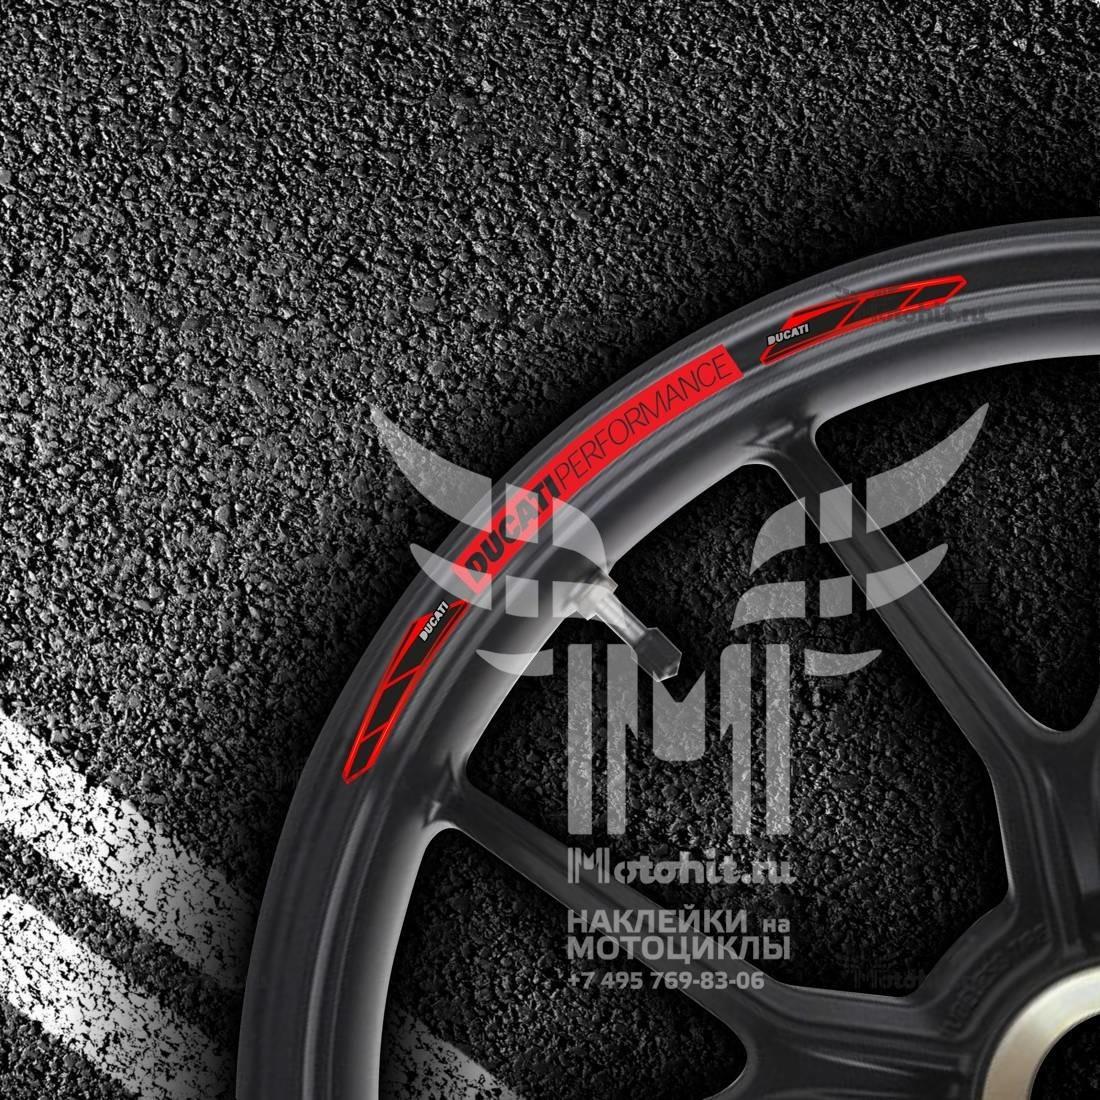 Комплект наклеек на обод колеса мотоцикла DUCATI PERFORMANCE-RED